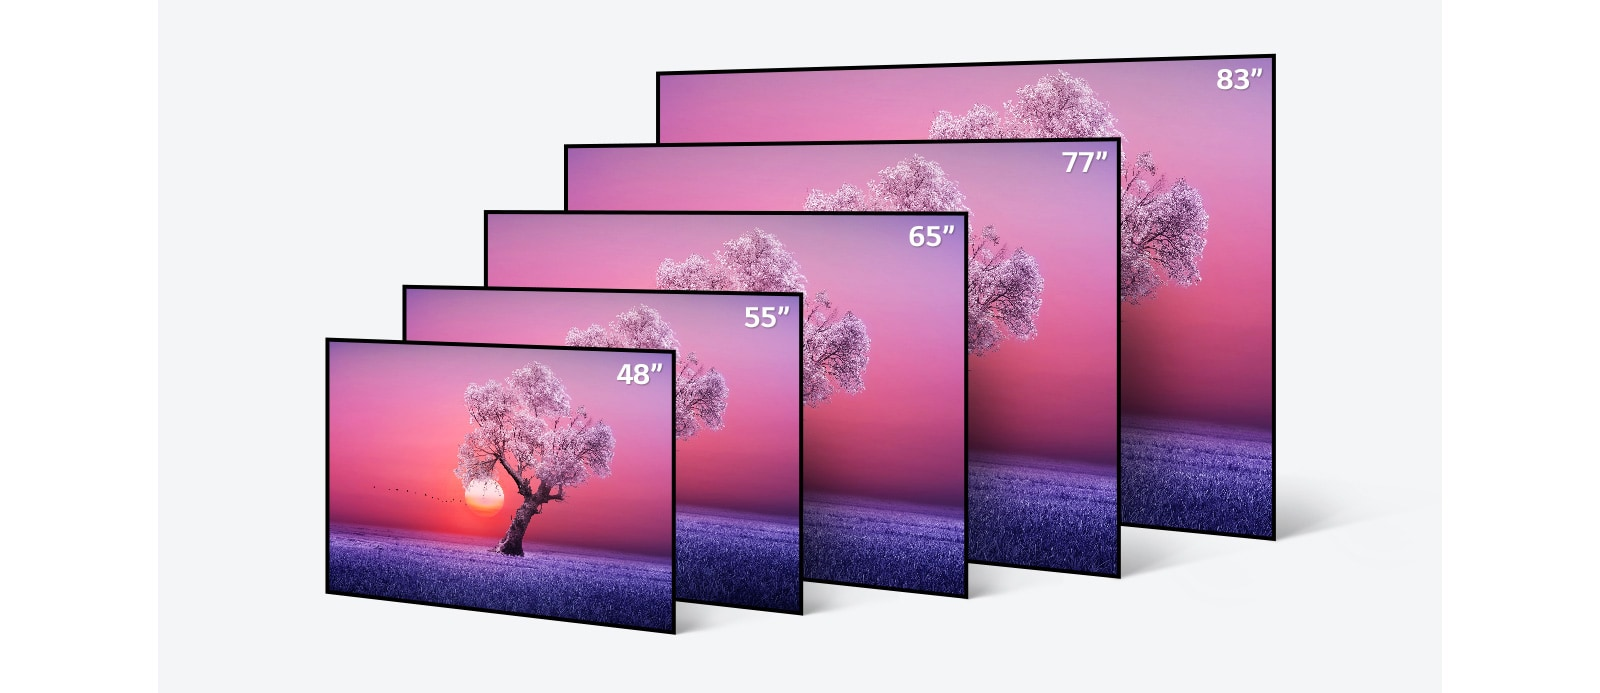 LG OLED 電視機身尺寸繁多(由 48 寸到 83 寸)